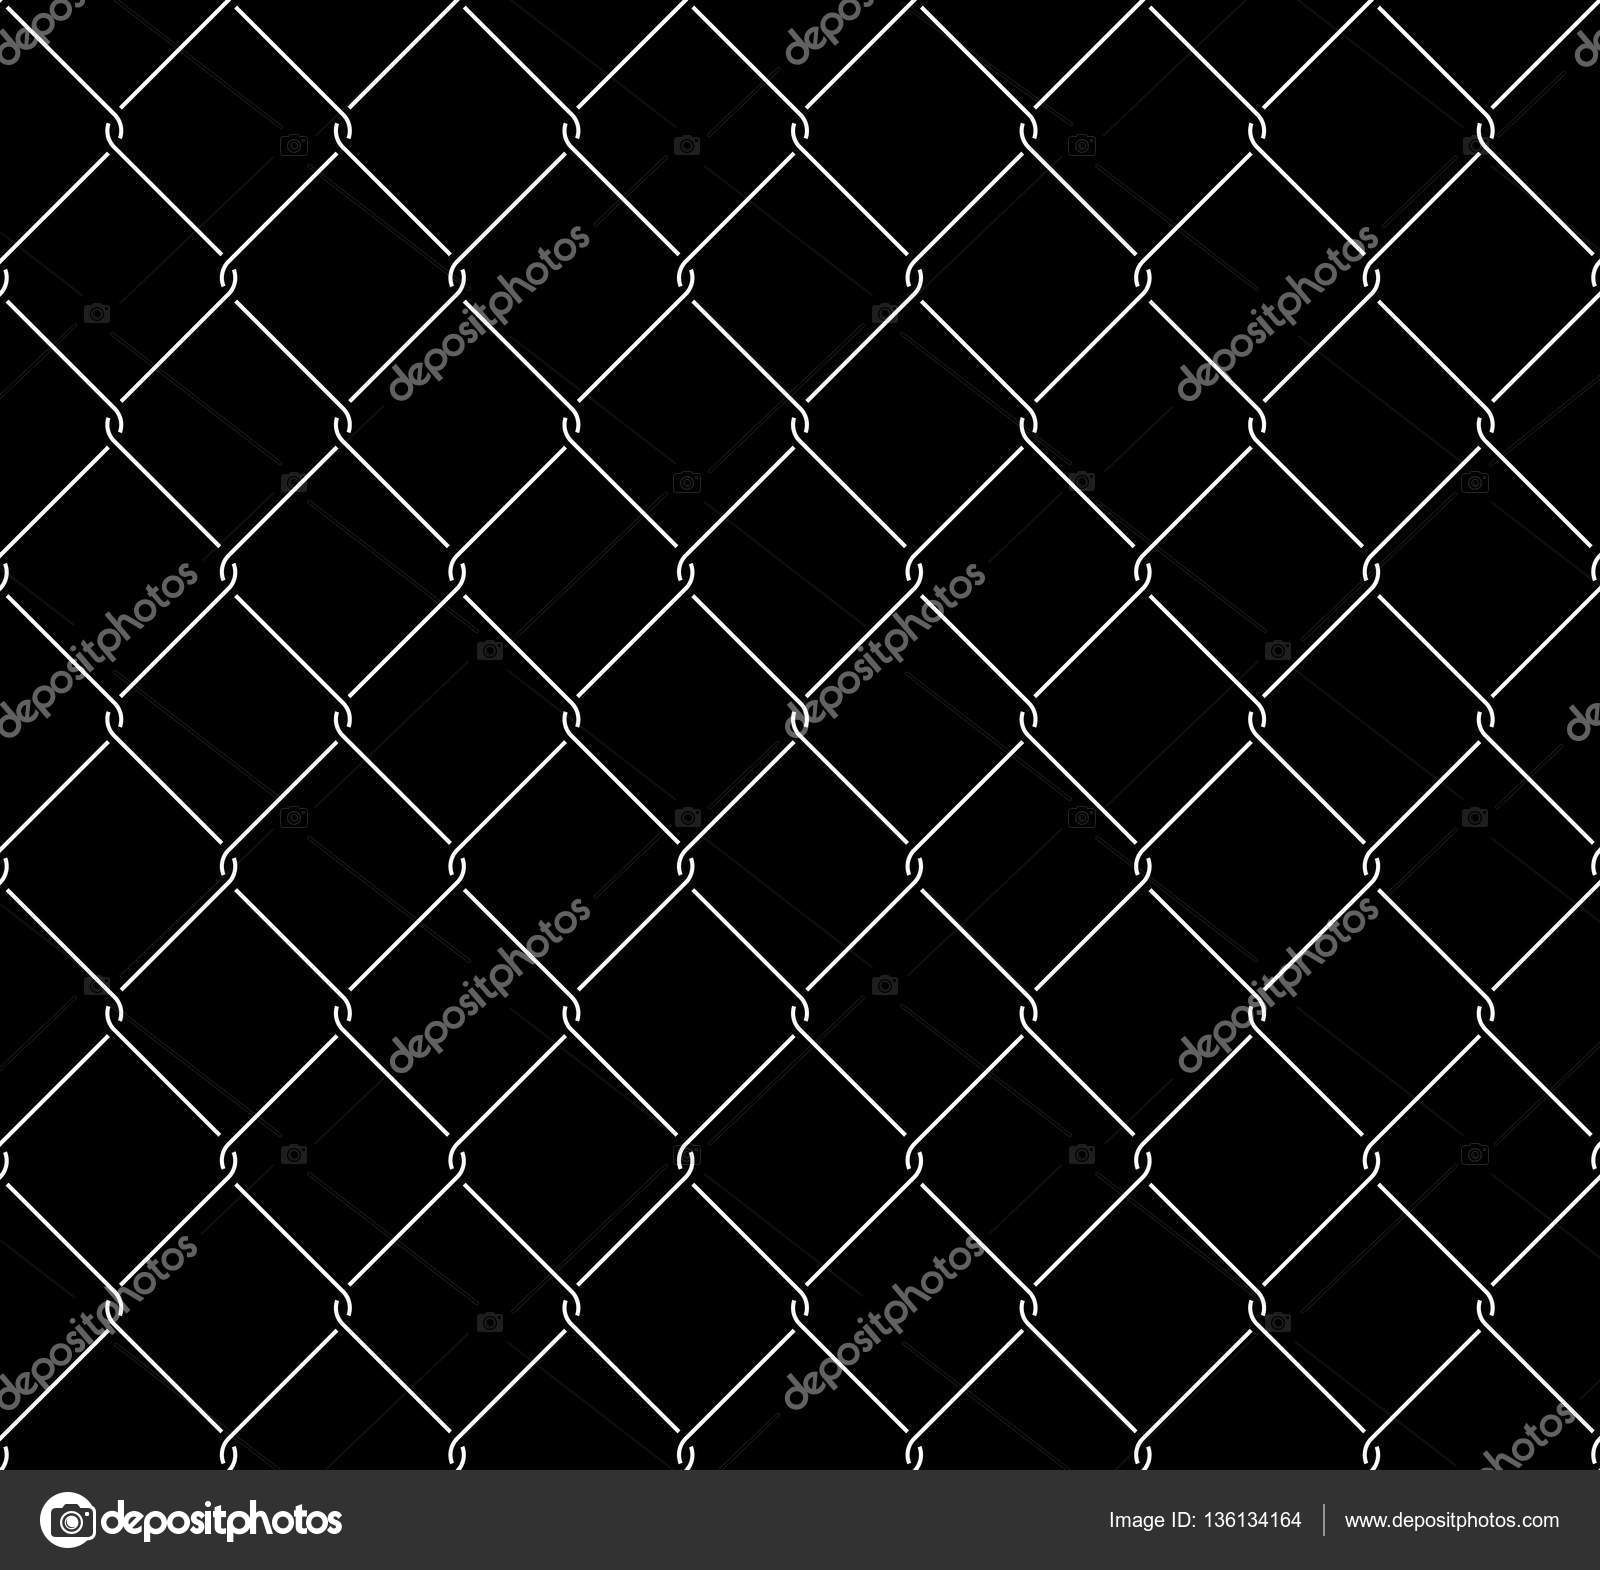 Metallic Wired Fence Seamless Texture Overlay — Stock Vector ...